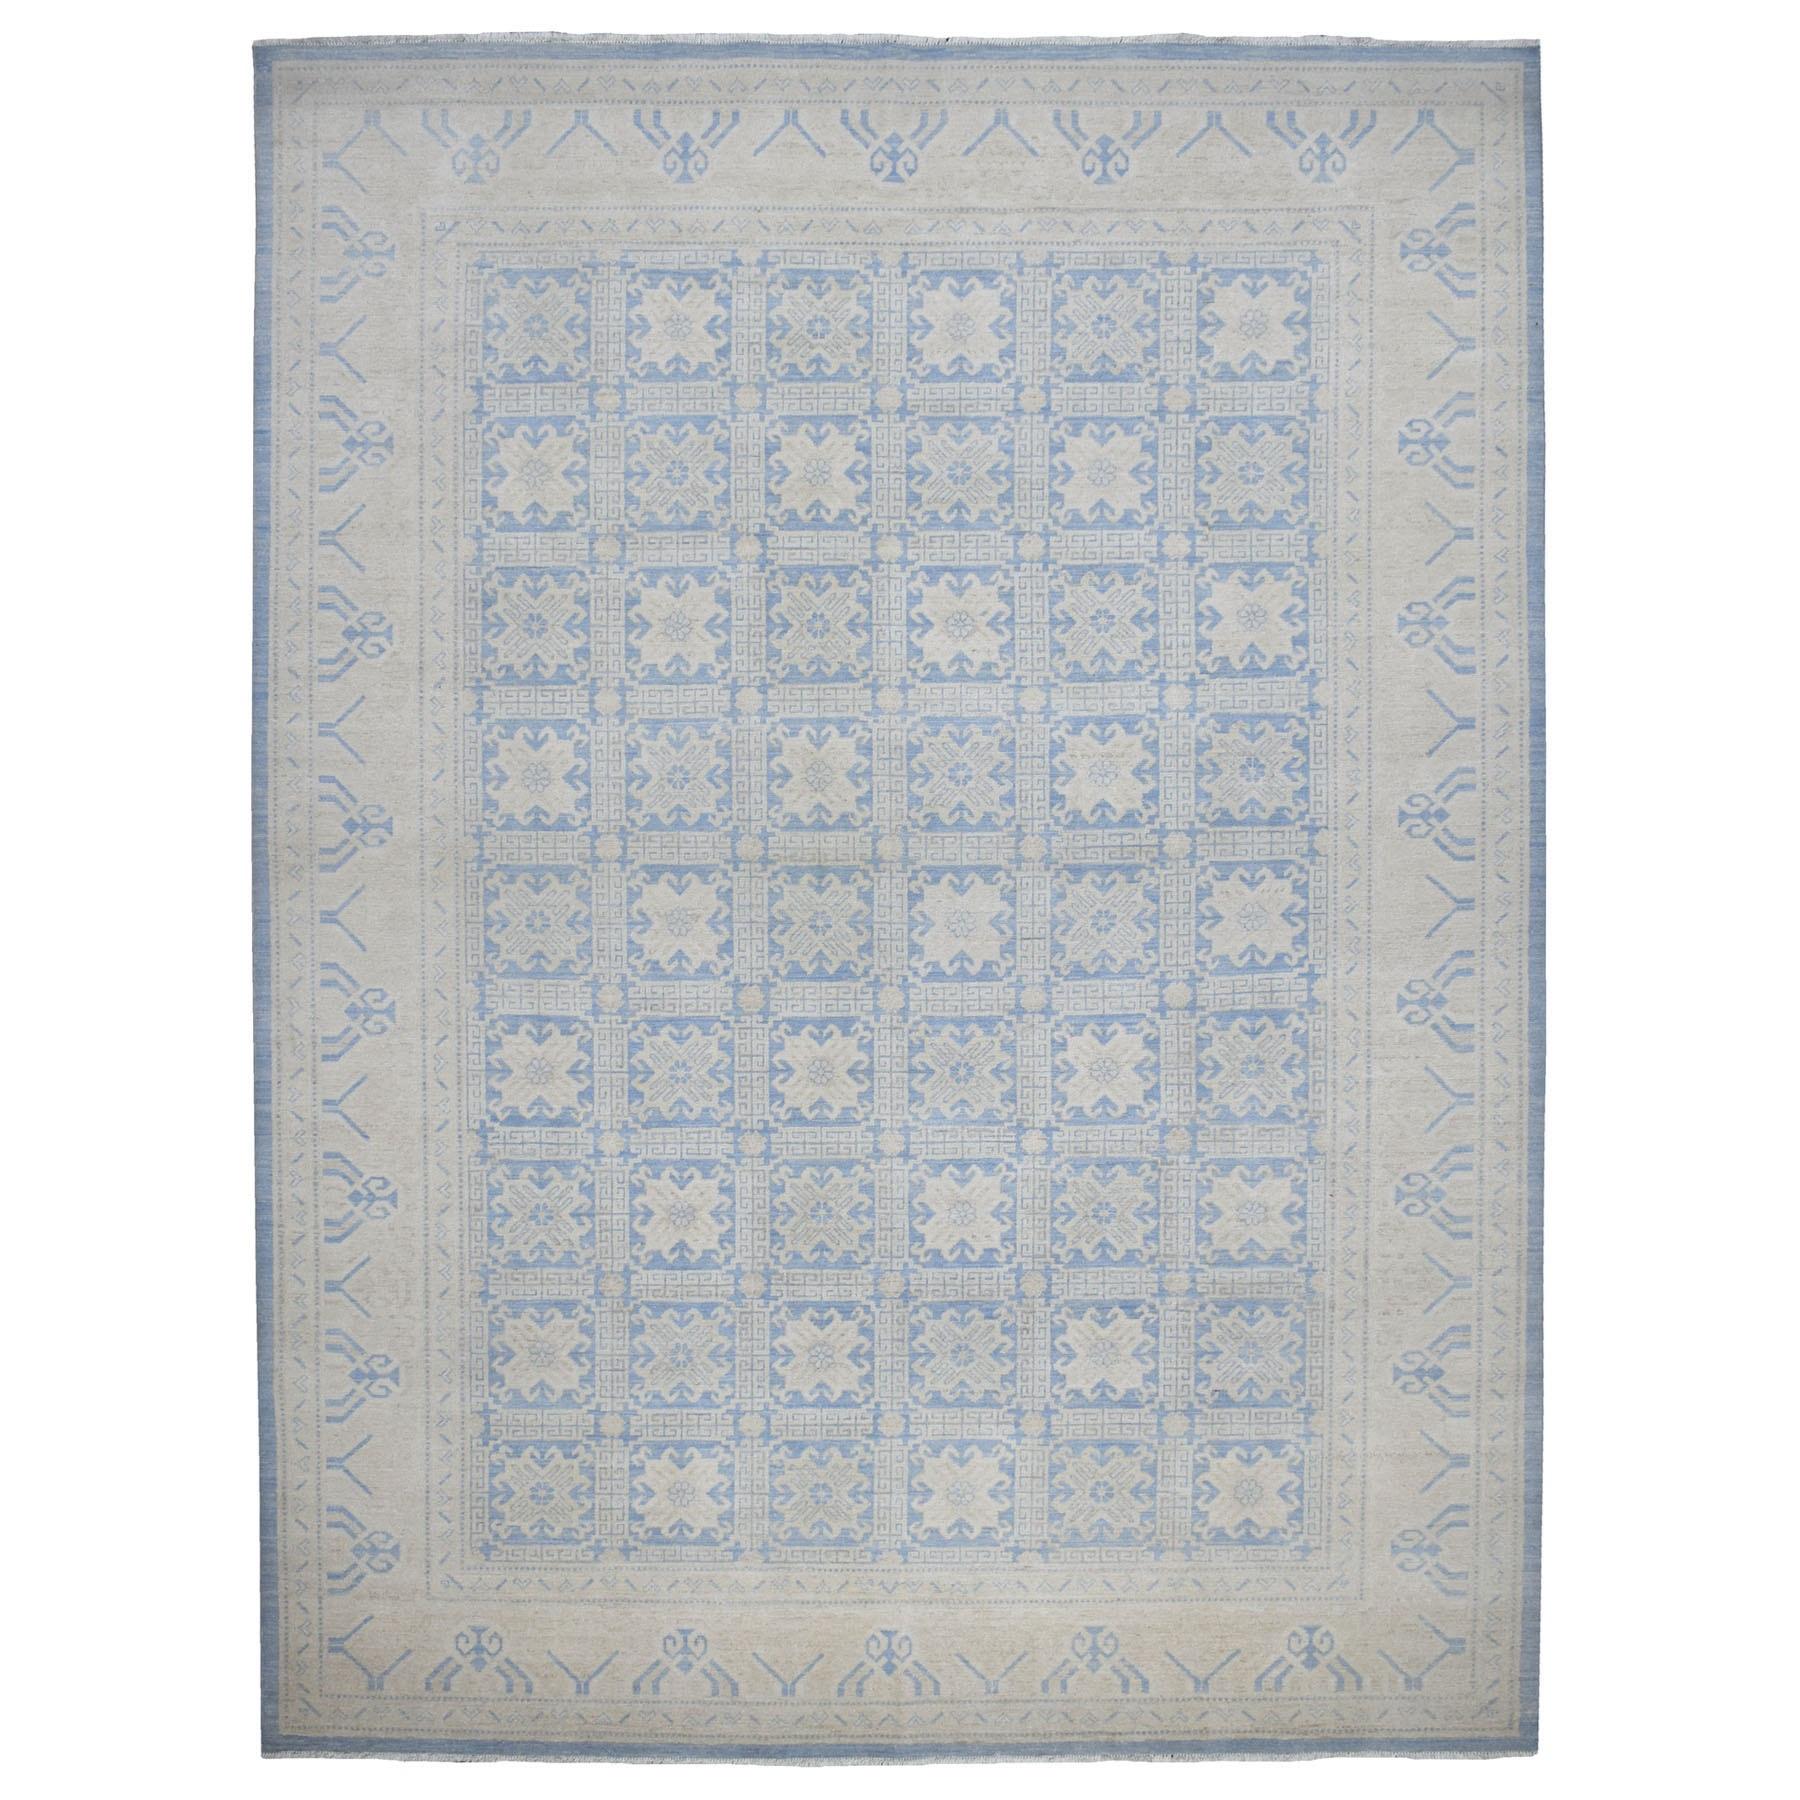 "10'1""x12'8"" Blue Stone Wash Peshawar Pure Wool Khotan Design Hand Knotted Oriental Rug"